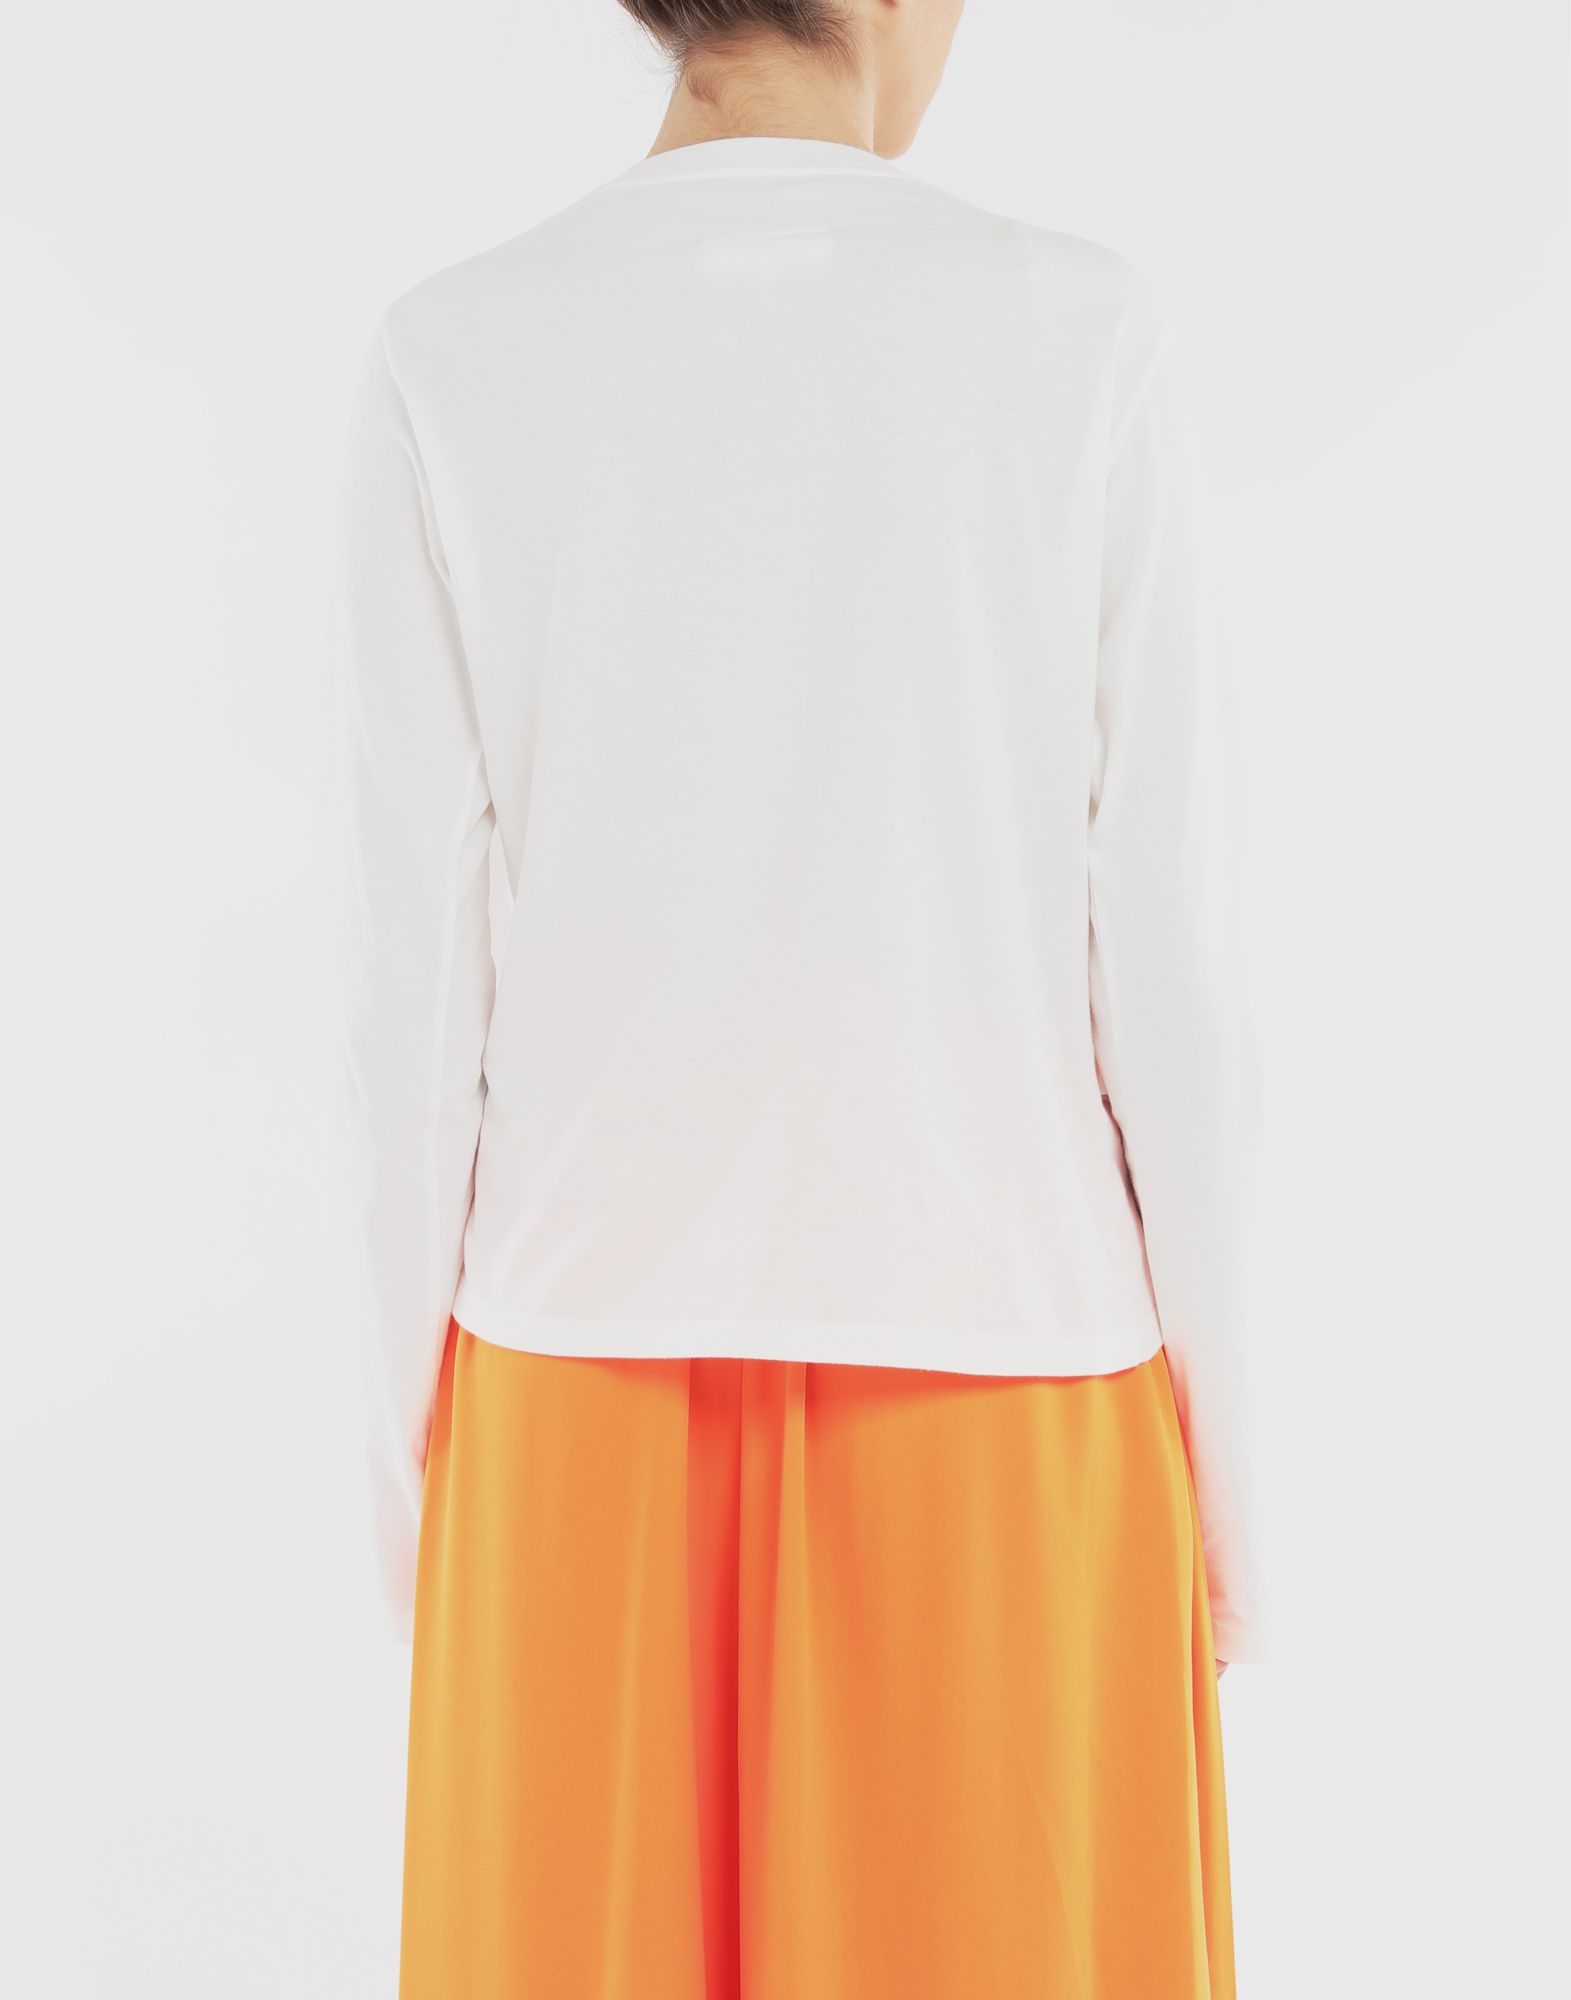 MM6 MAISON MARGIELA Double layer top Long sleeve t-shirt Woman e